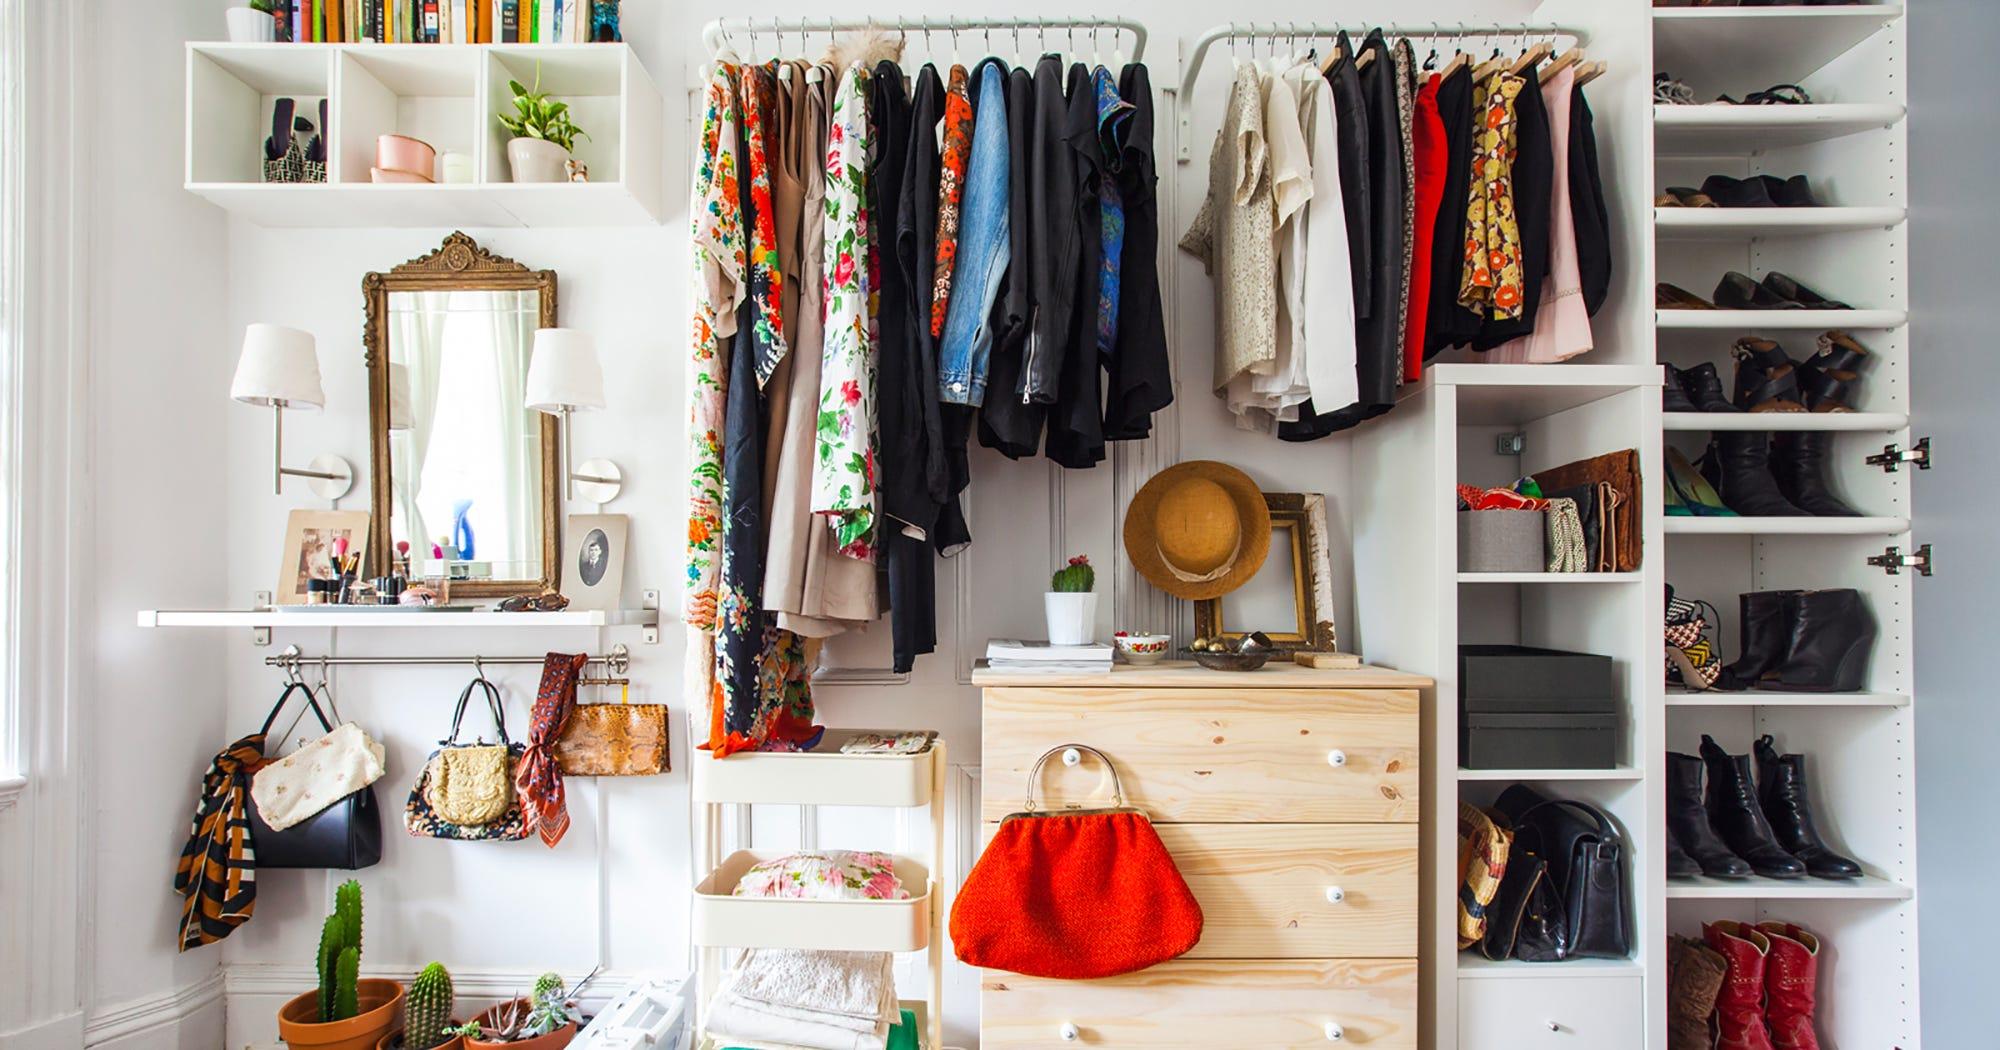 Organized Closet Essay Why I Love My Closet